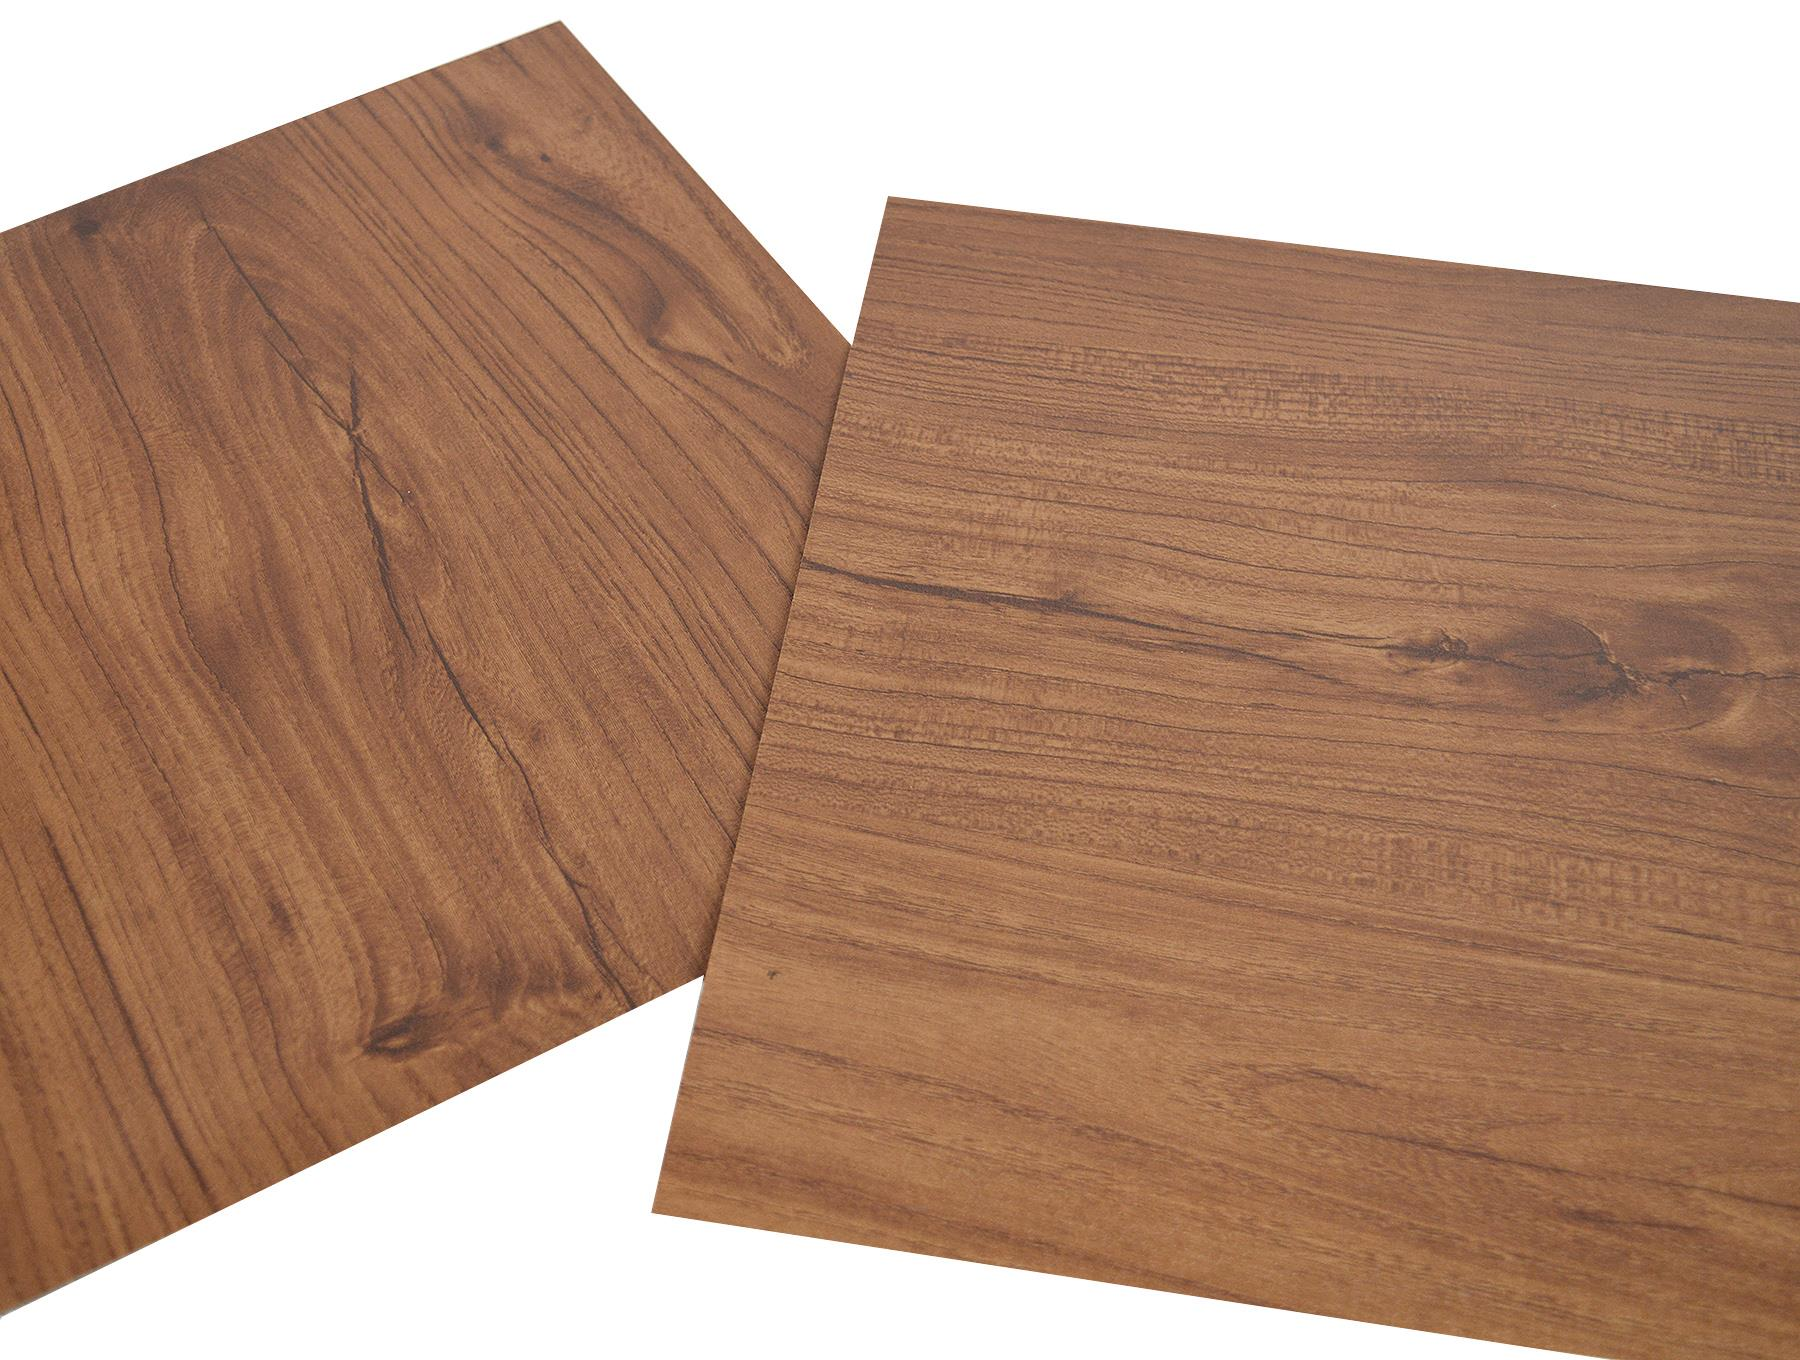 Floor-Tiles-Self-Adhesive-Vinyl-Flooring-Kitchen-Bathroom-Brown-Wood-Grain thumbnail 33